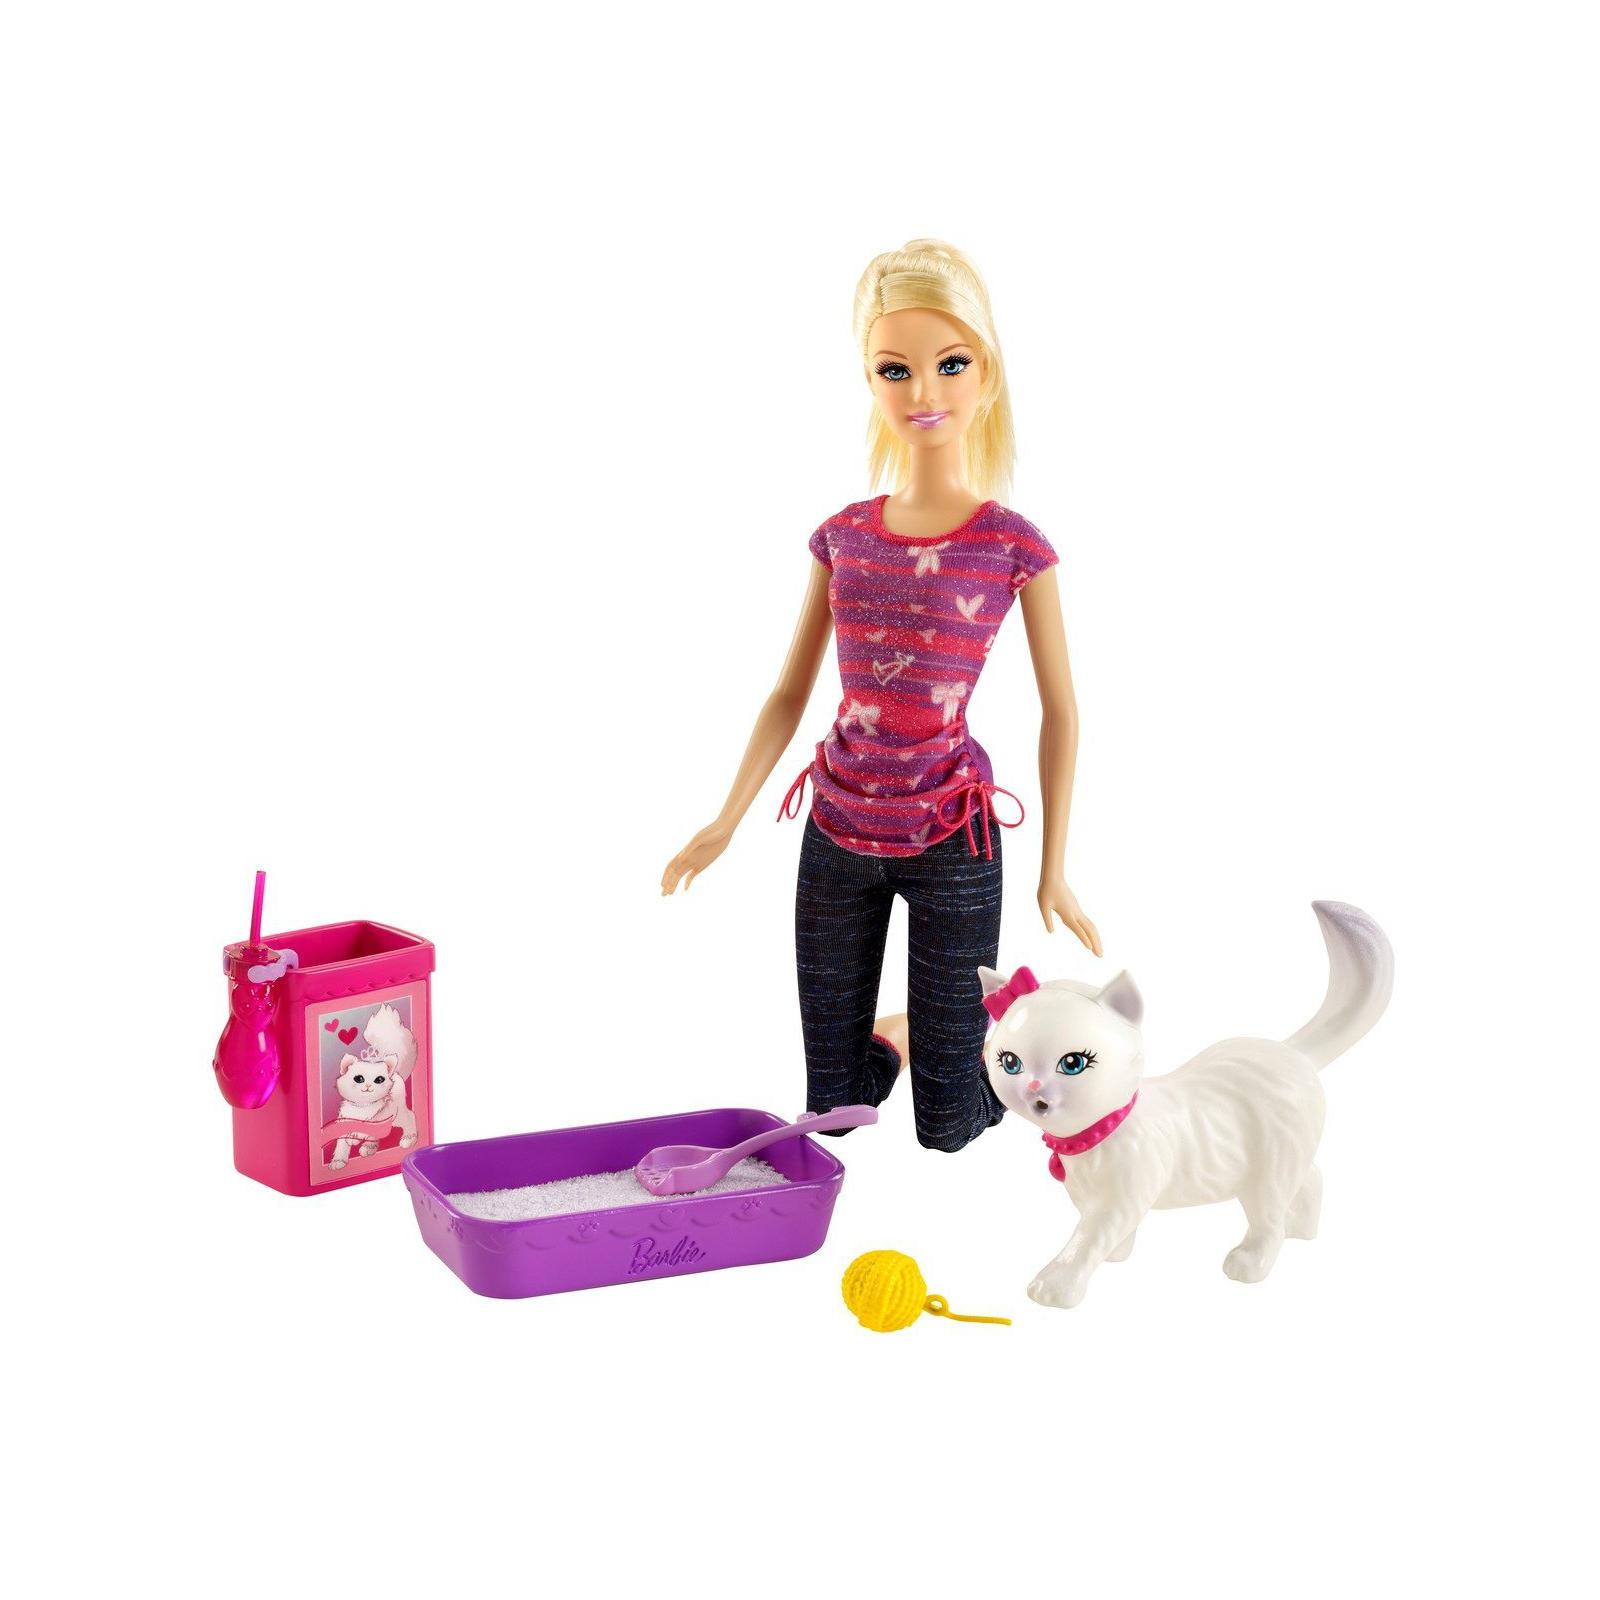 ������� ����� Barbie ����� ��������� �� ��������, � ������